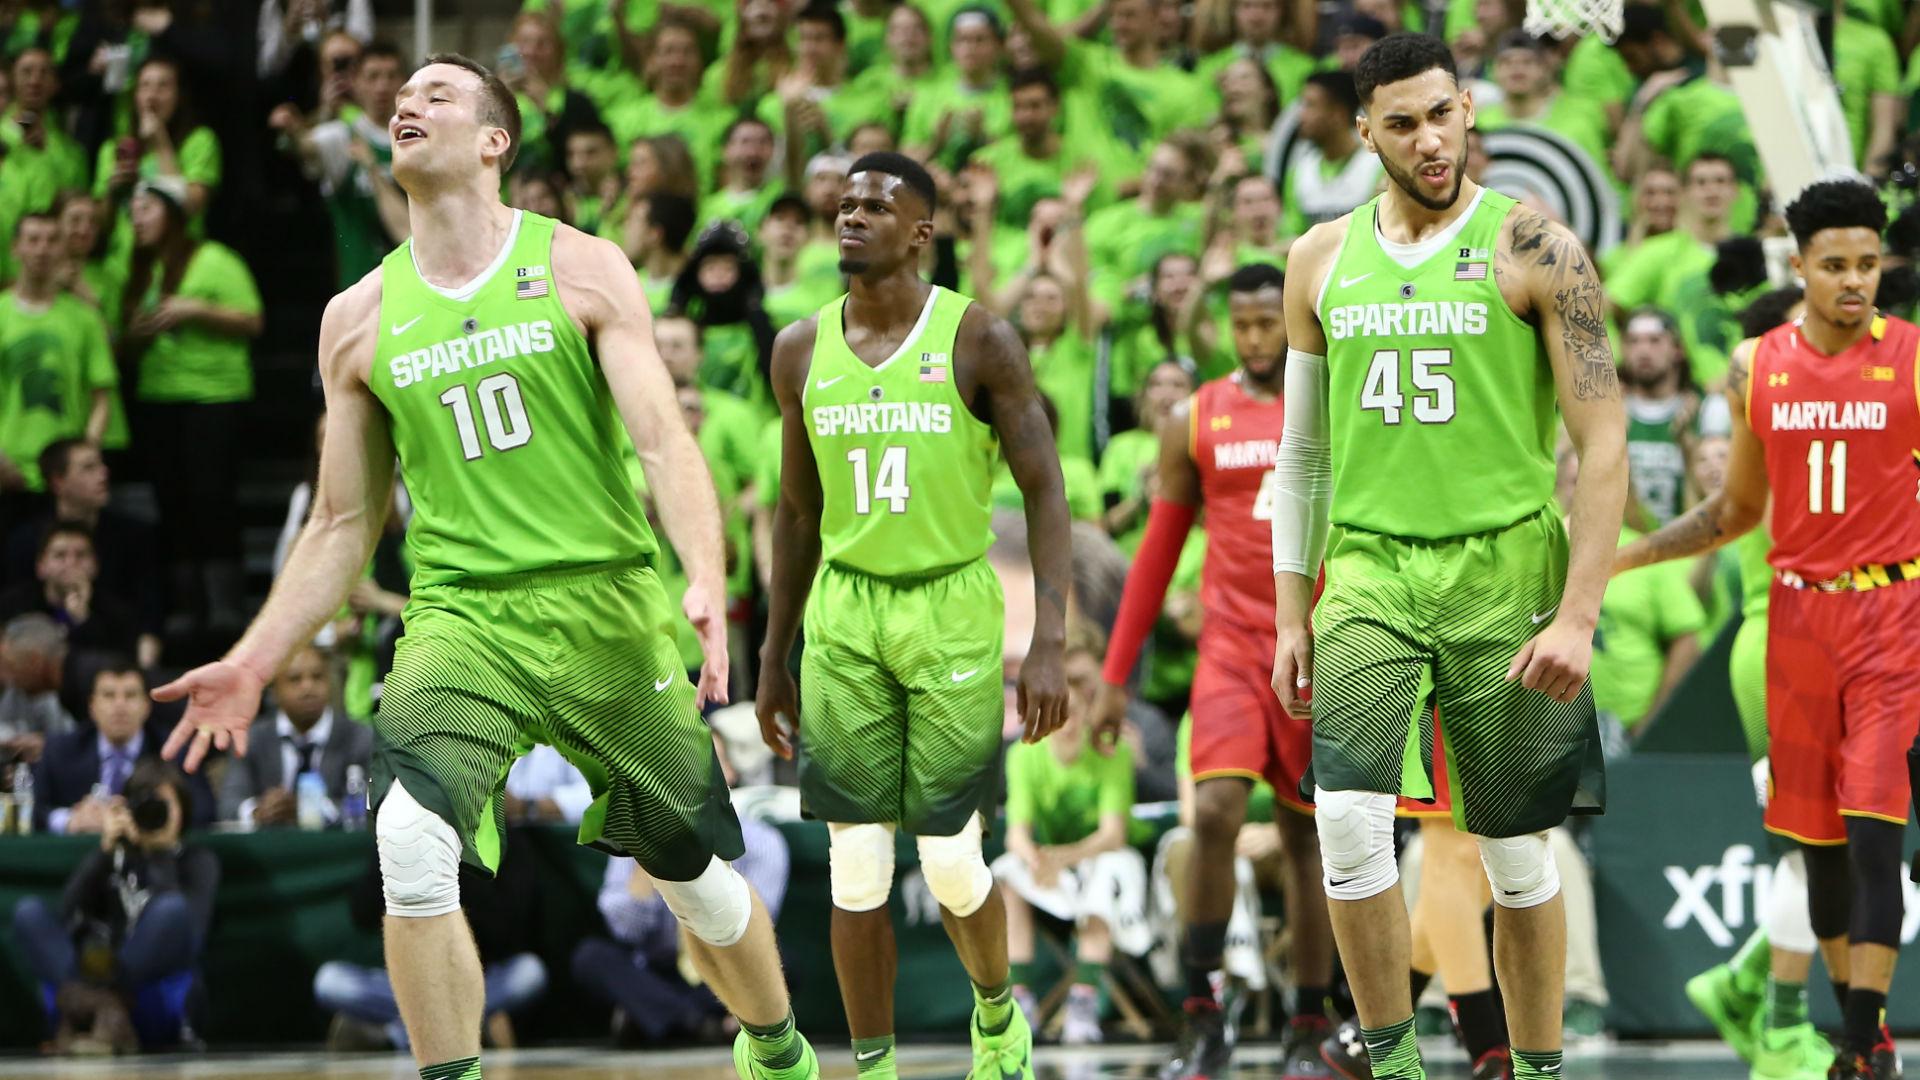 Michigan State won't wear lime green uniforms again this season | NCAA Basketball | Sporting News